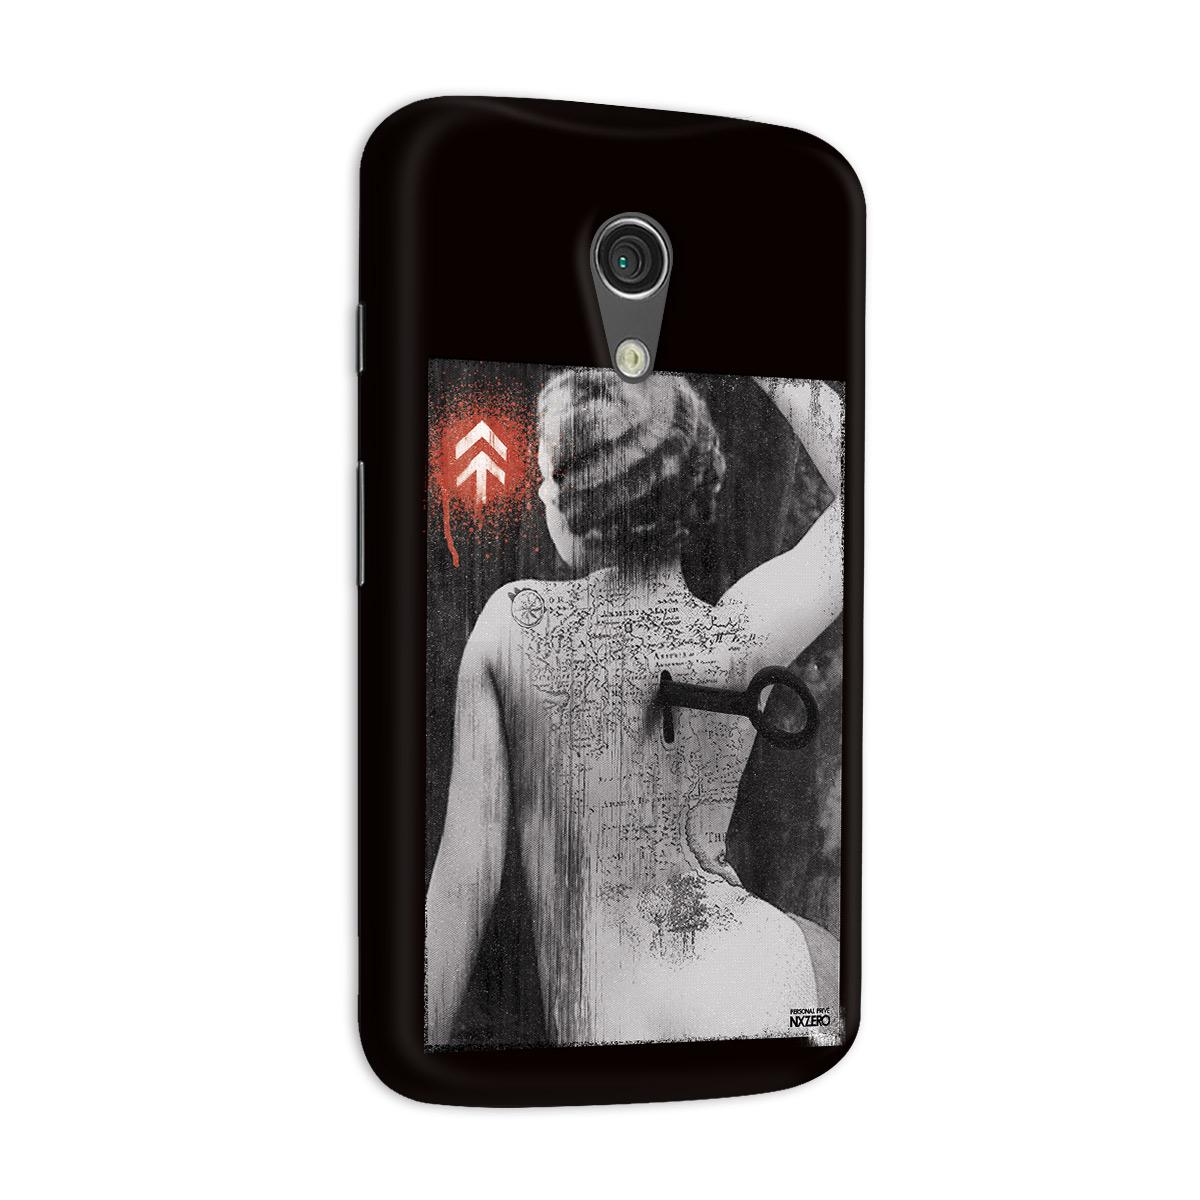 Capa para Motorola Moto G 2 NXZero Personal Prive